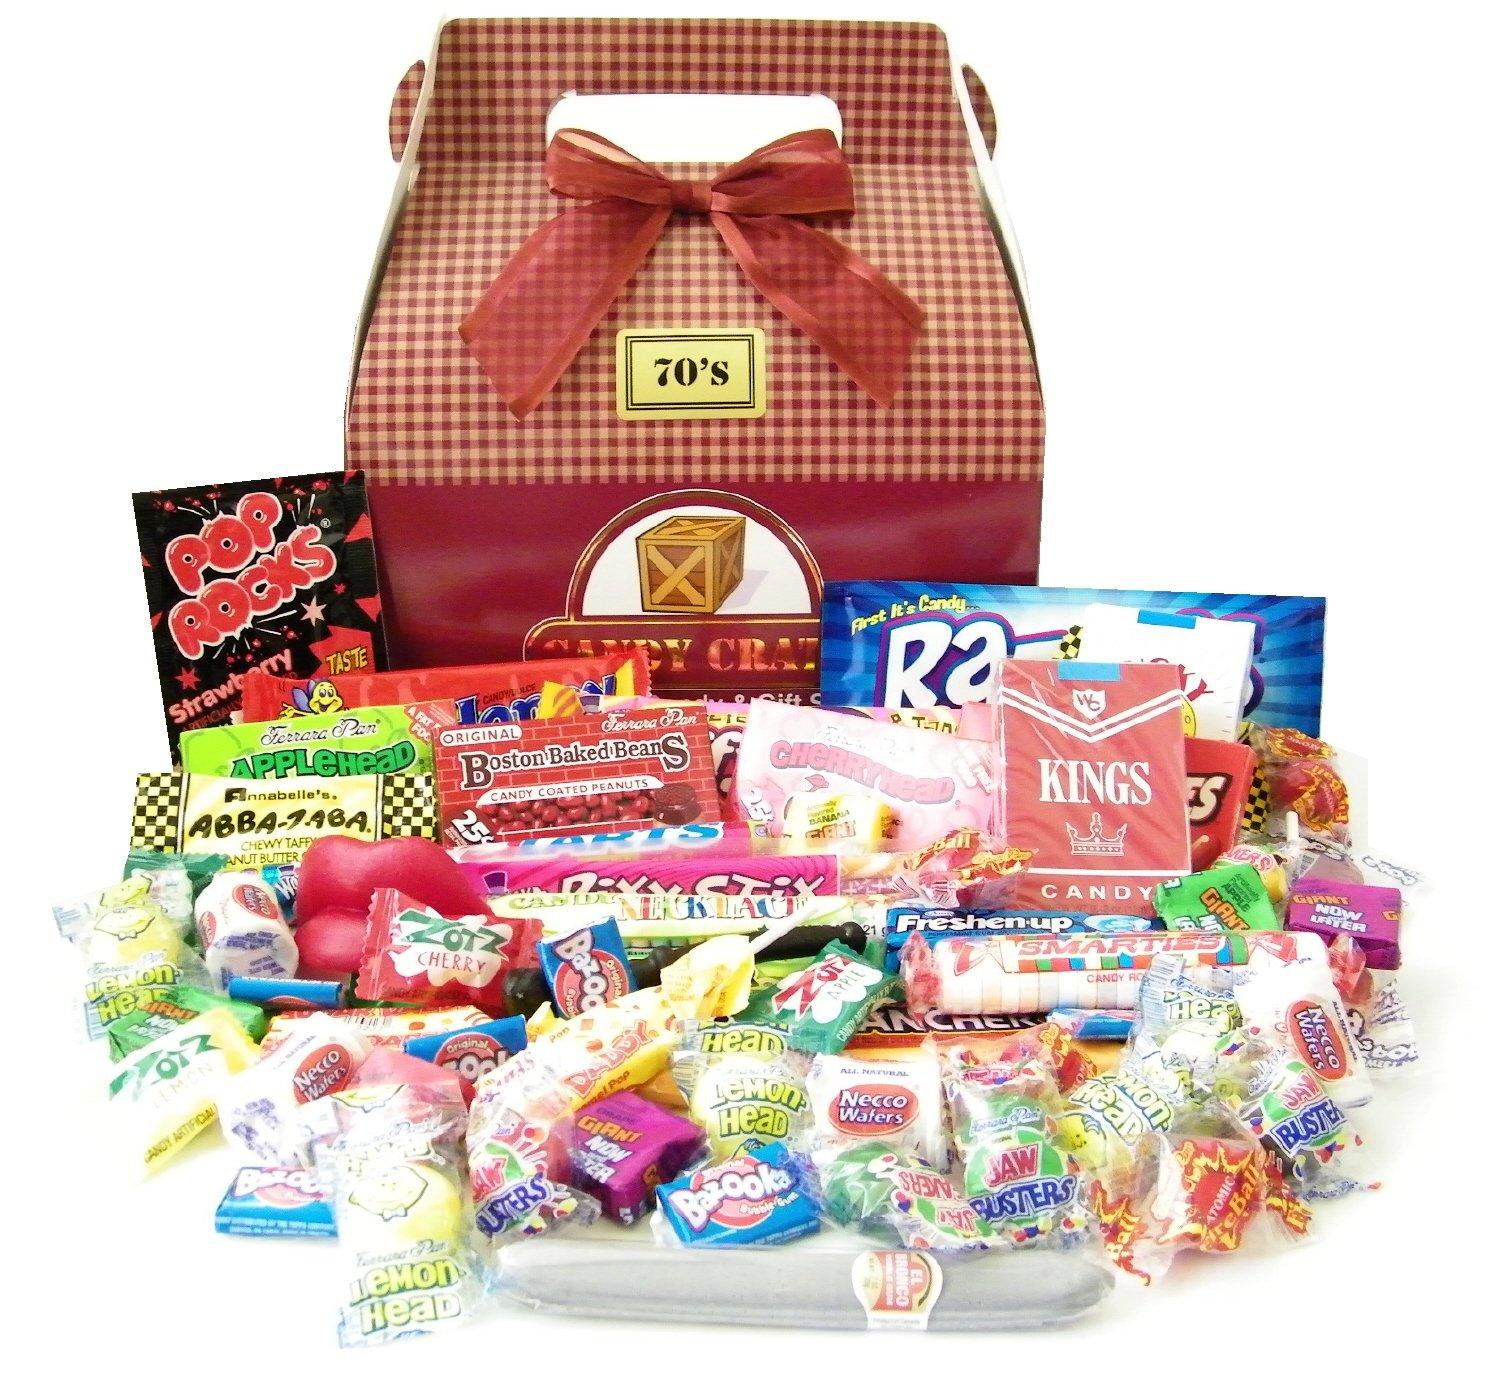 1970's Retro Candy Gift Box, Nostalgic Candy Decade Assortment - Over 50 pieces!